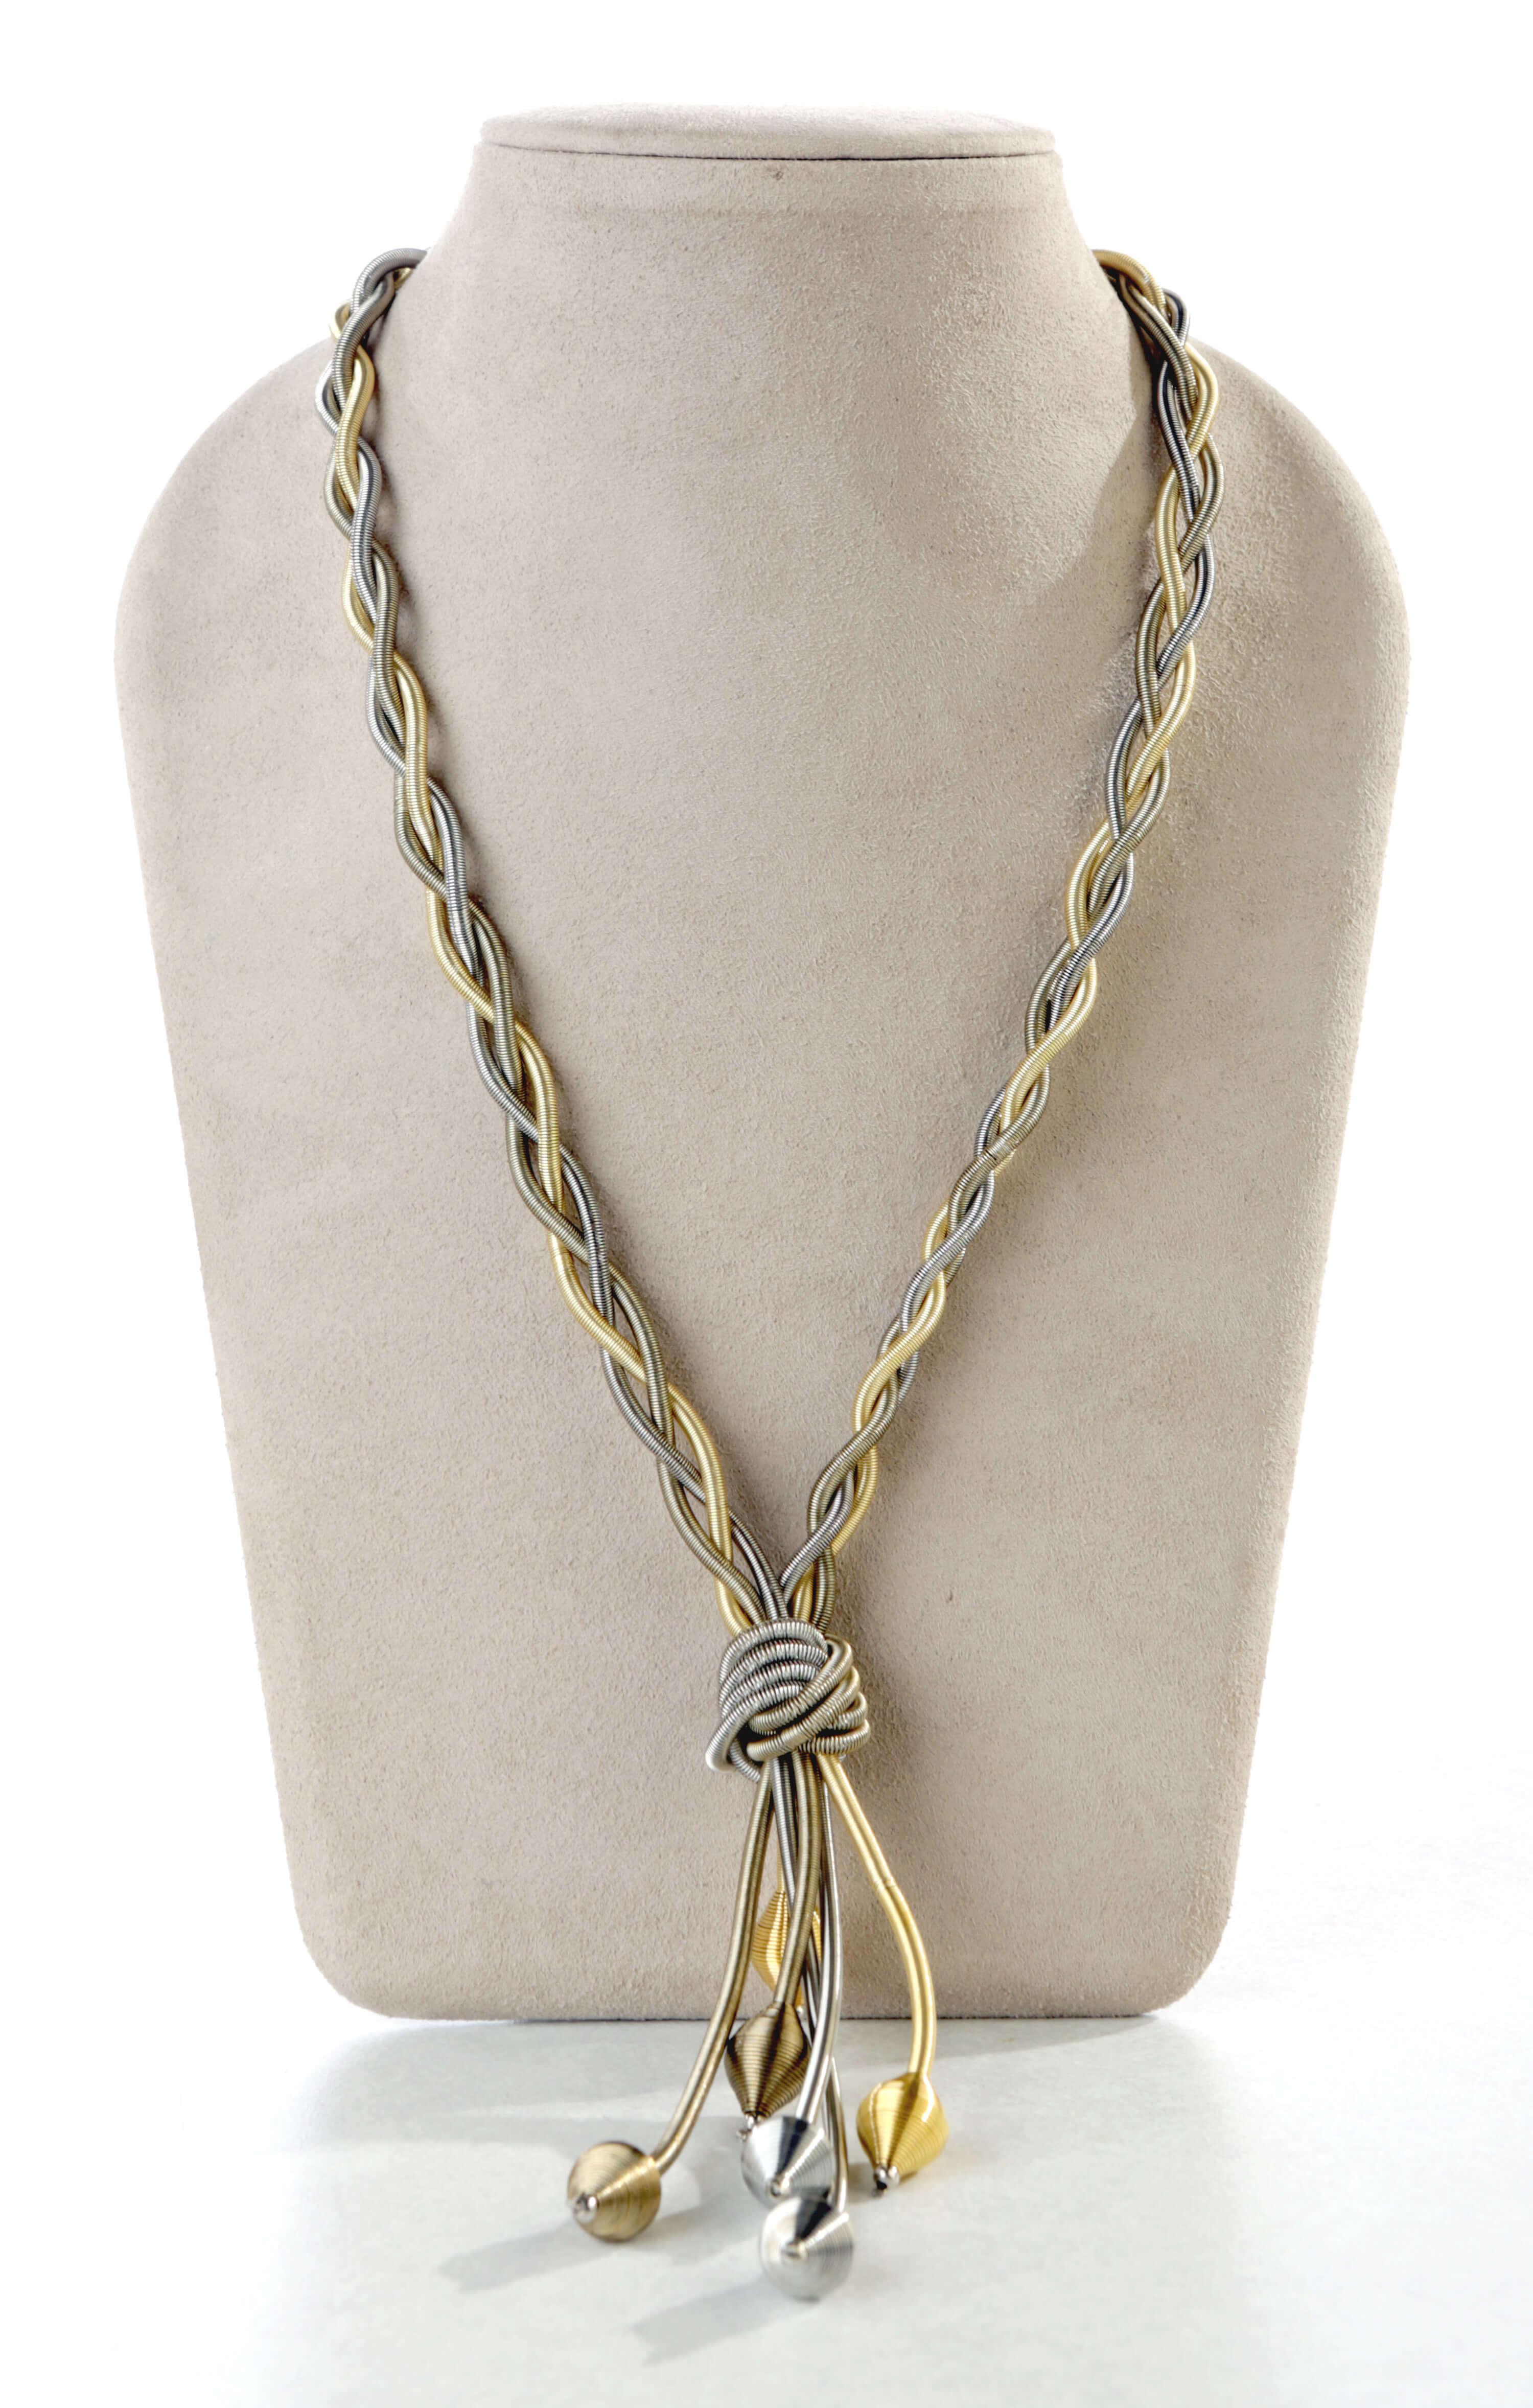 Piano wire necklace